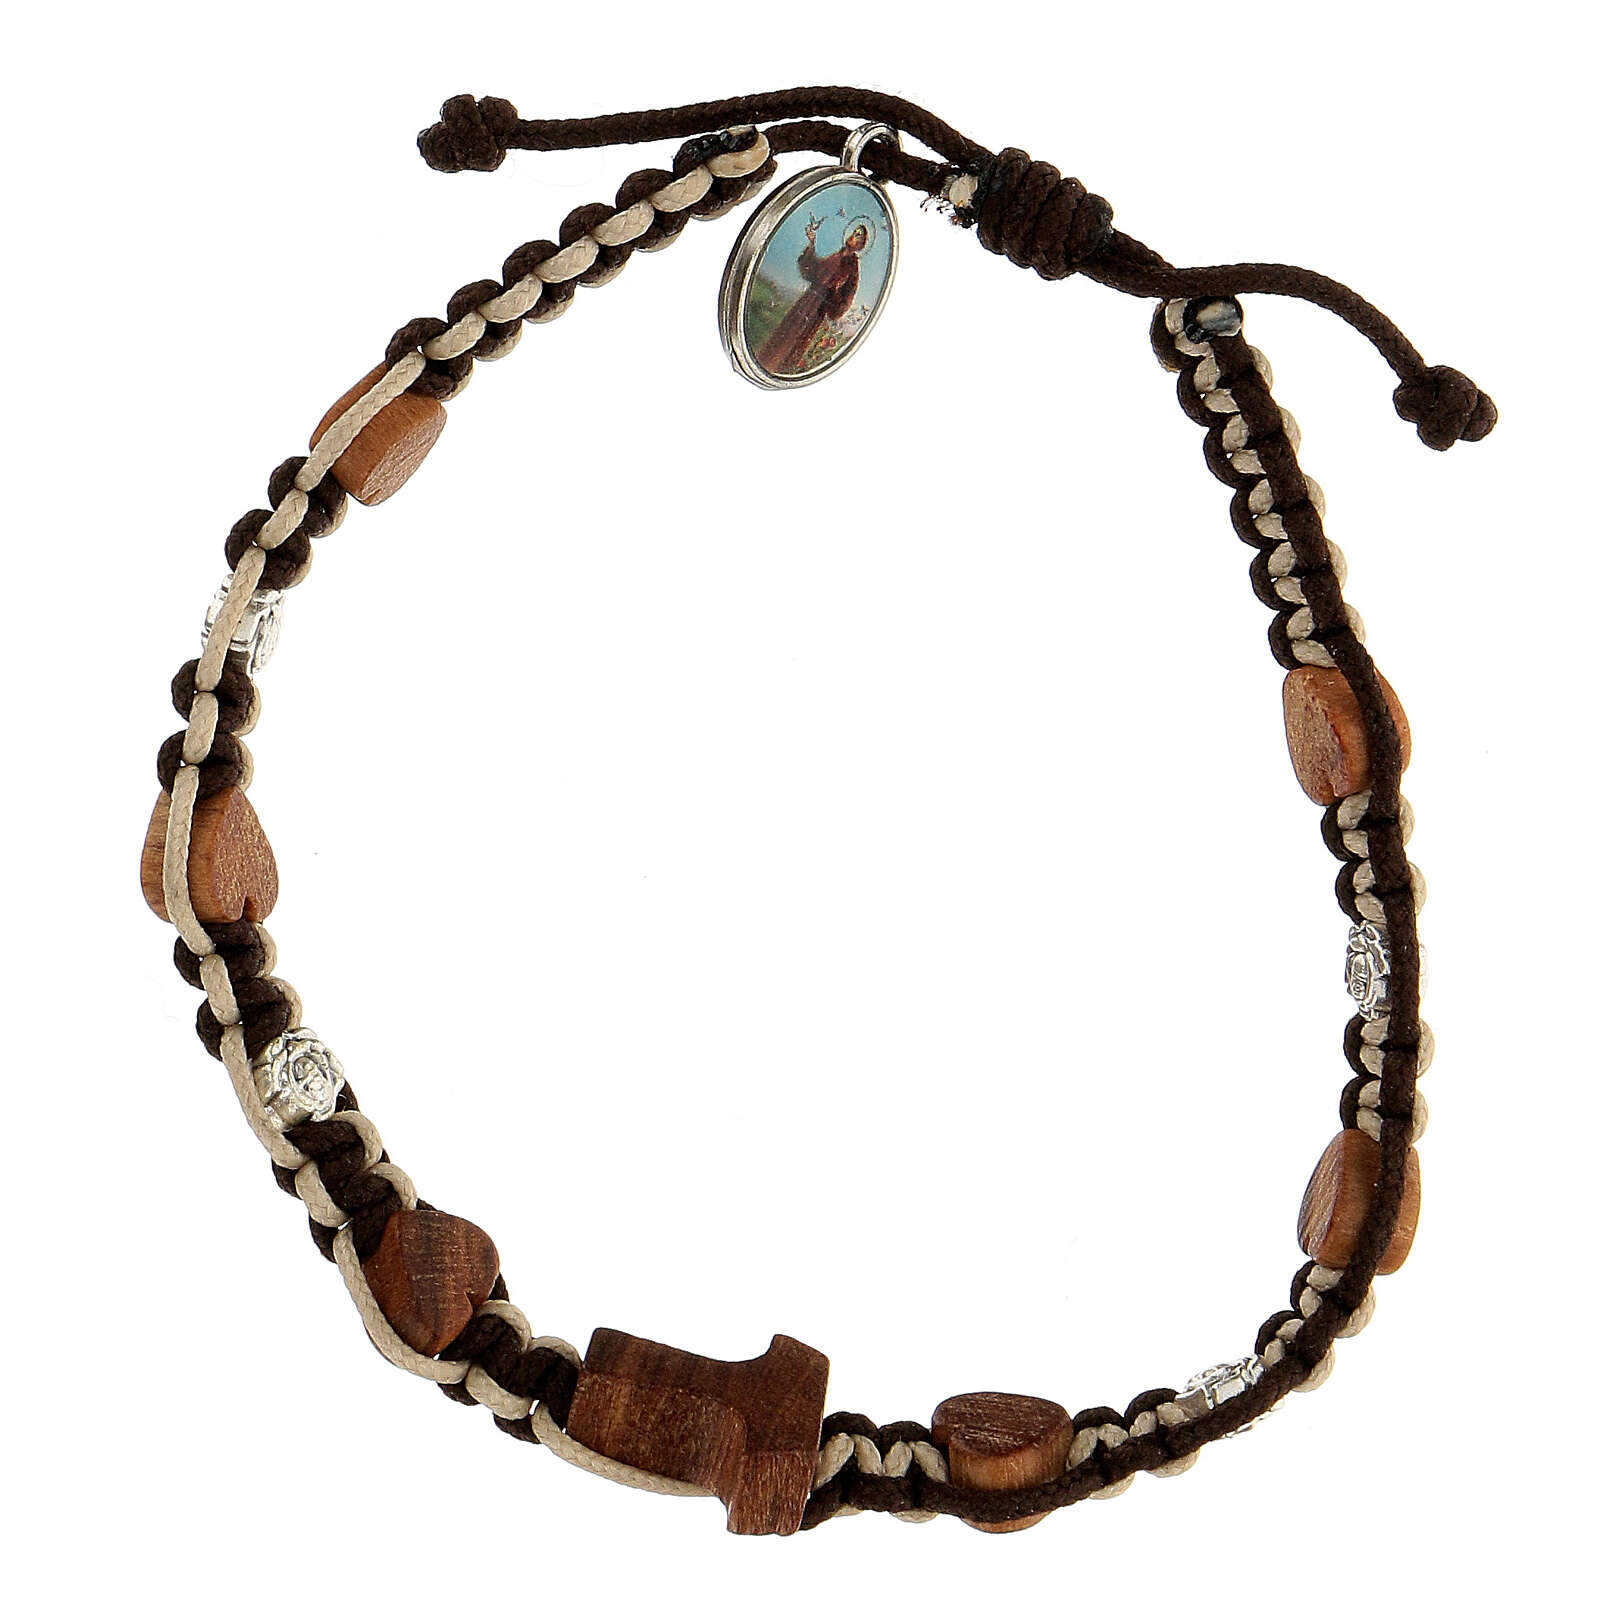 Pulsera Medjugorje corazones tau madera olivo rosas cuerda marrón-beis 4